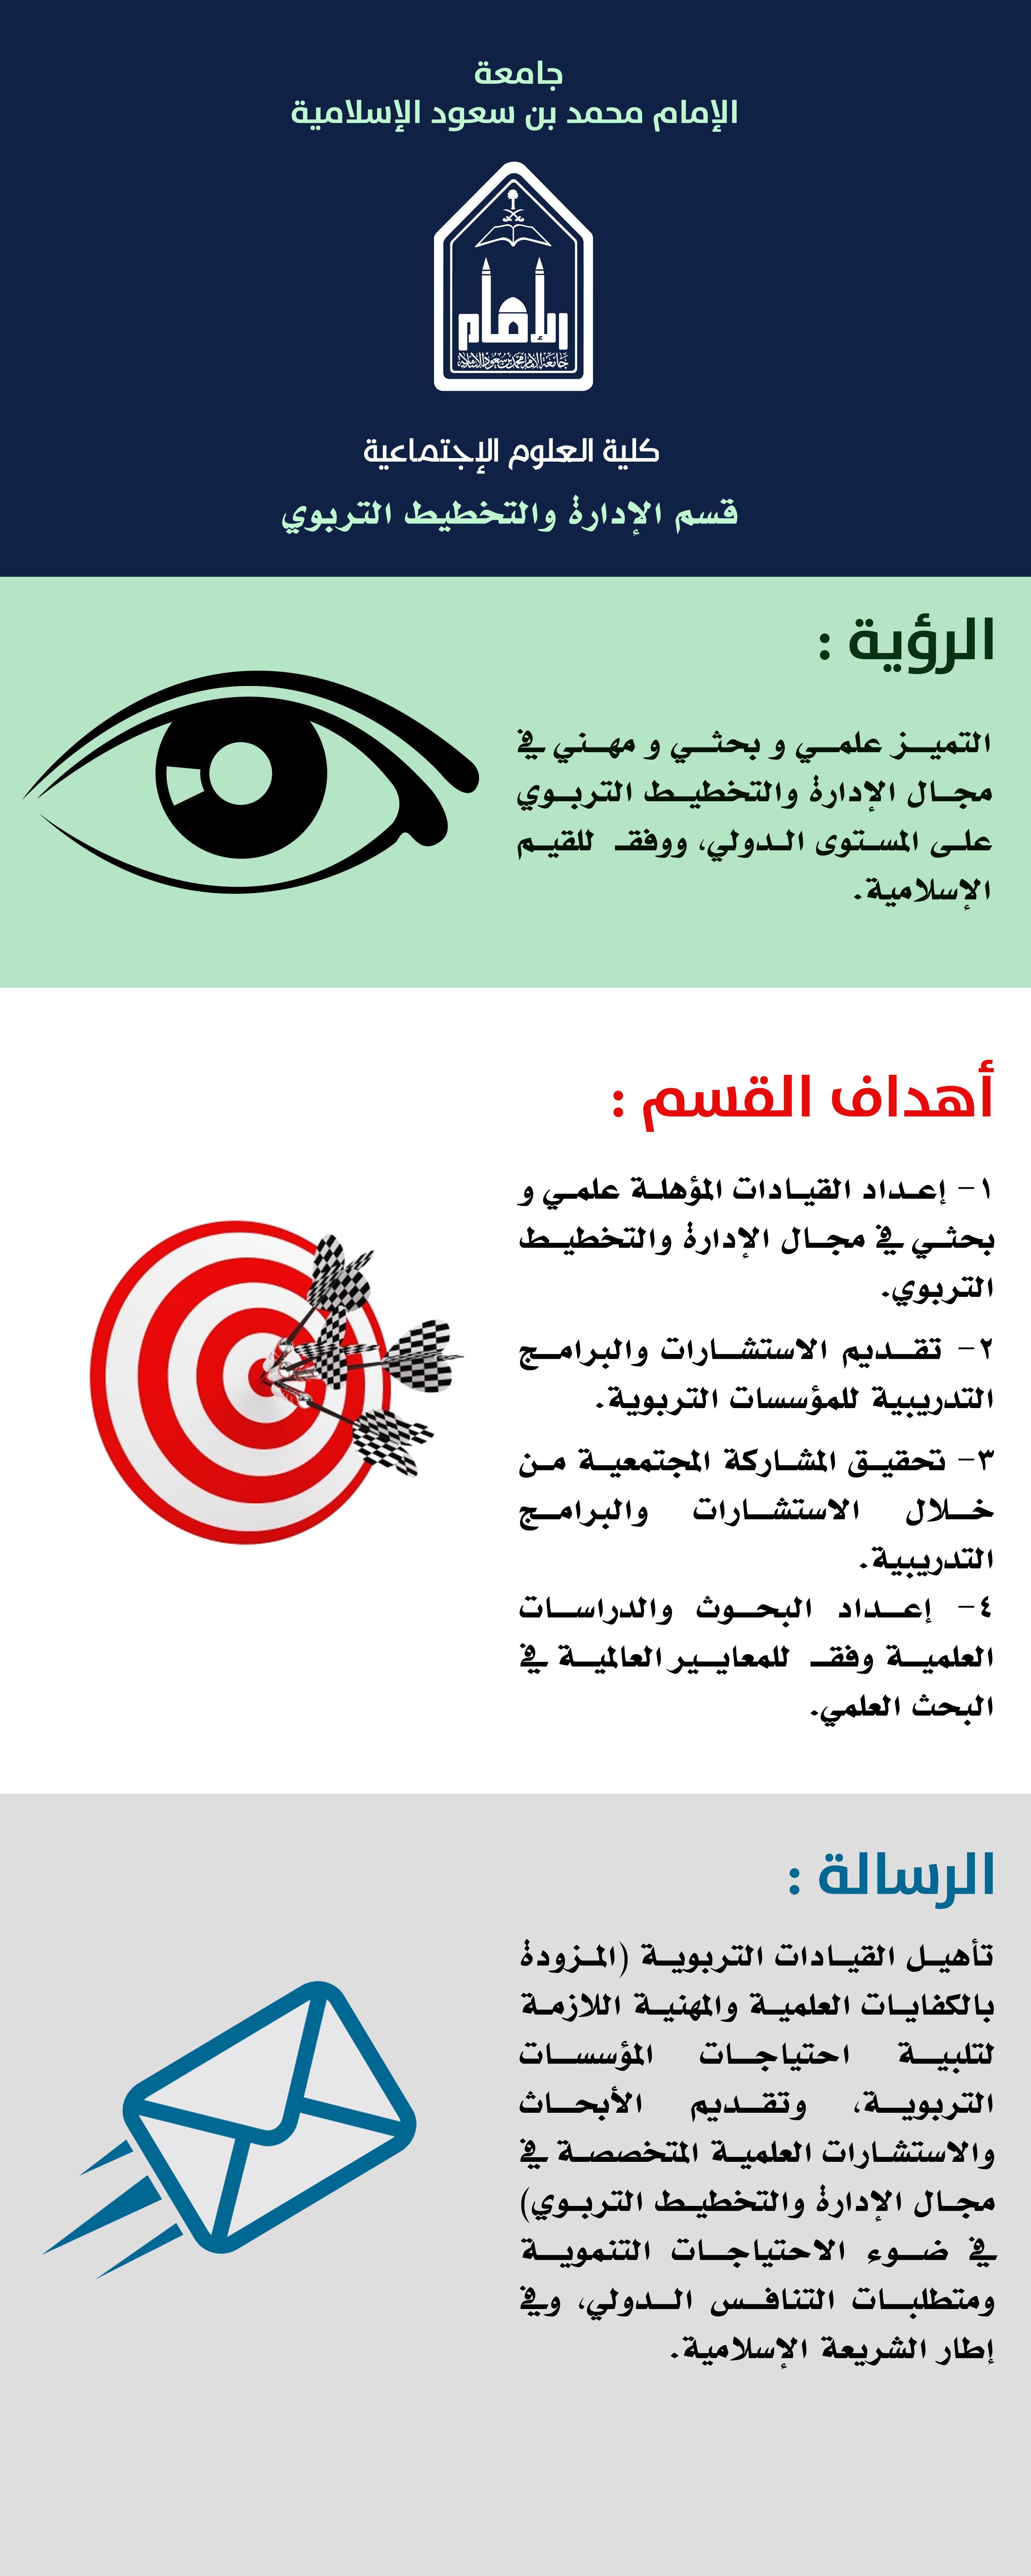 Pin By Fayhan Alotibi On جامعة الامام Acl